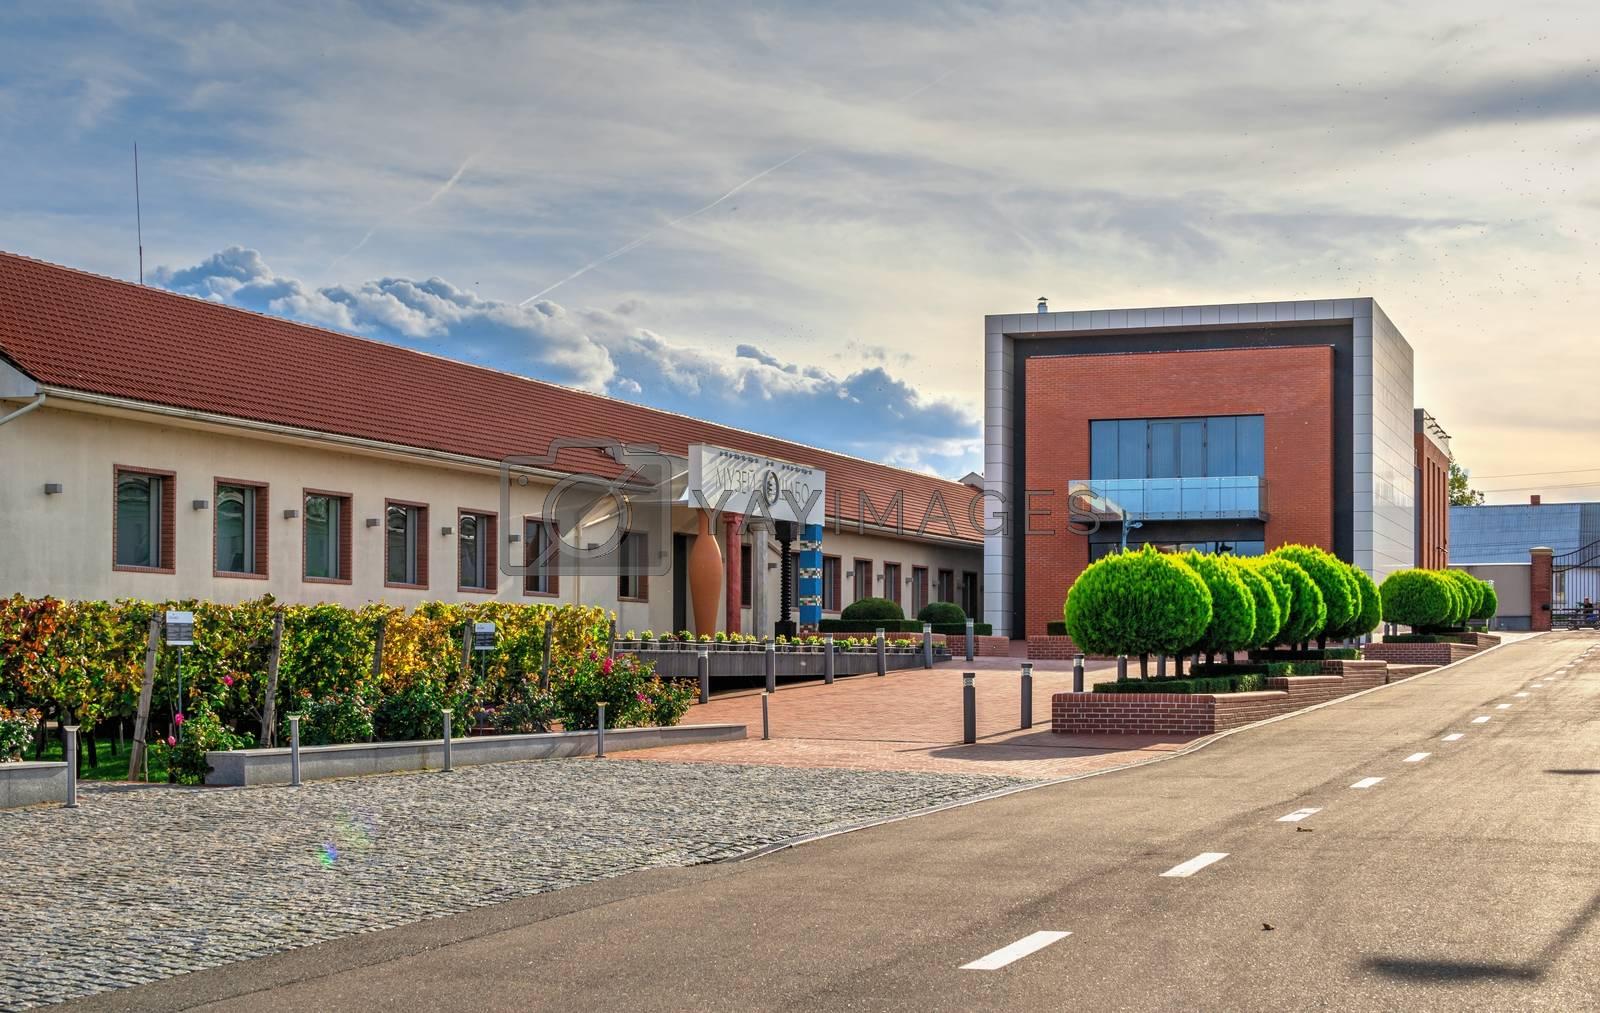 Shabo, Ukraine 09.29.2019. Museum of Wine Culture in the Shabo winery, Odessa region, Ukraine